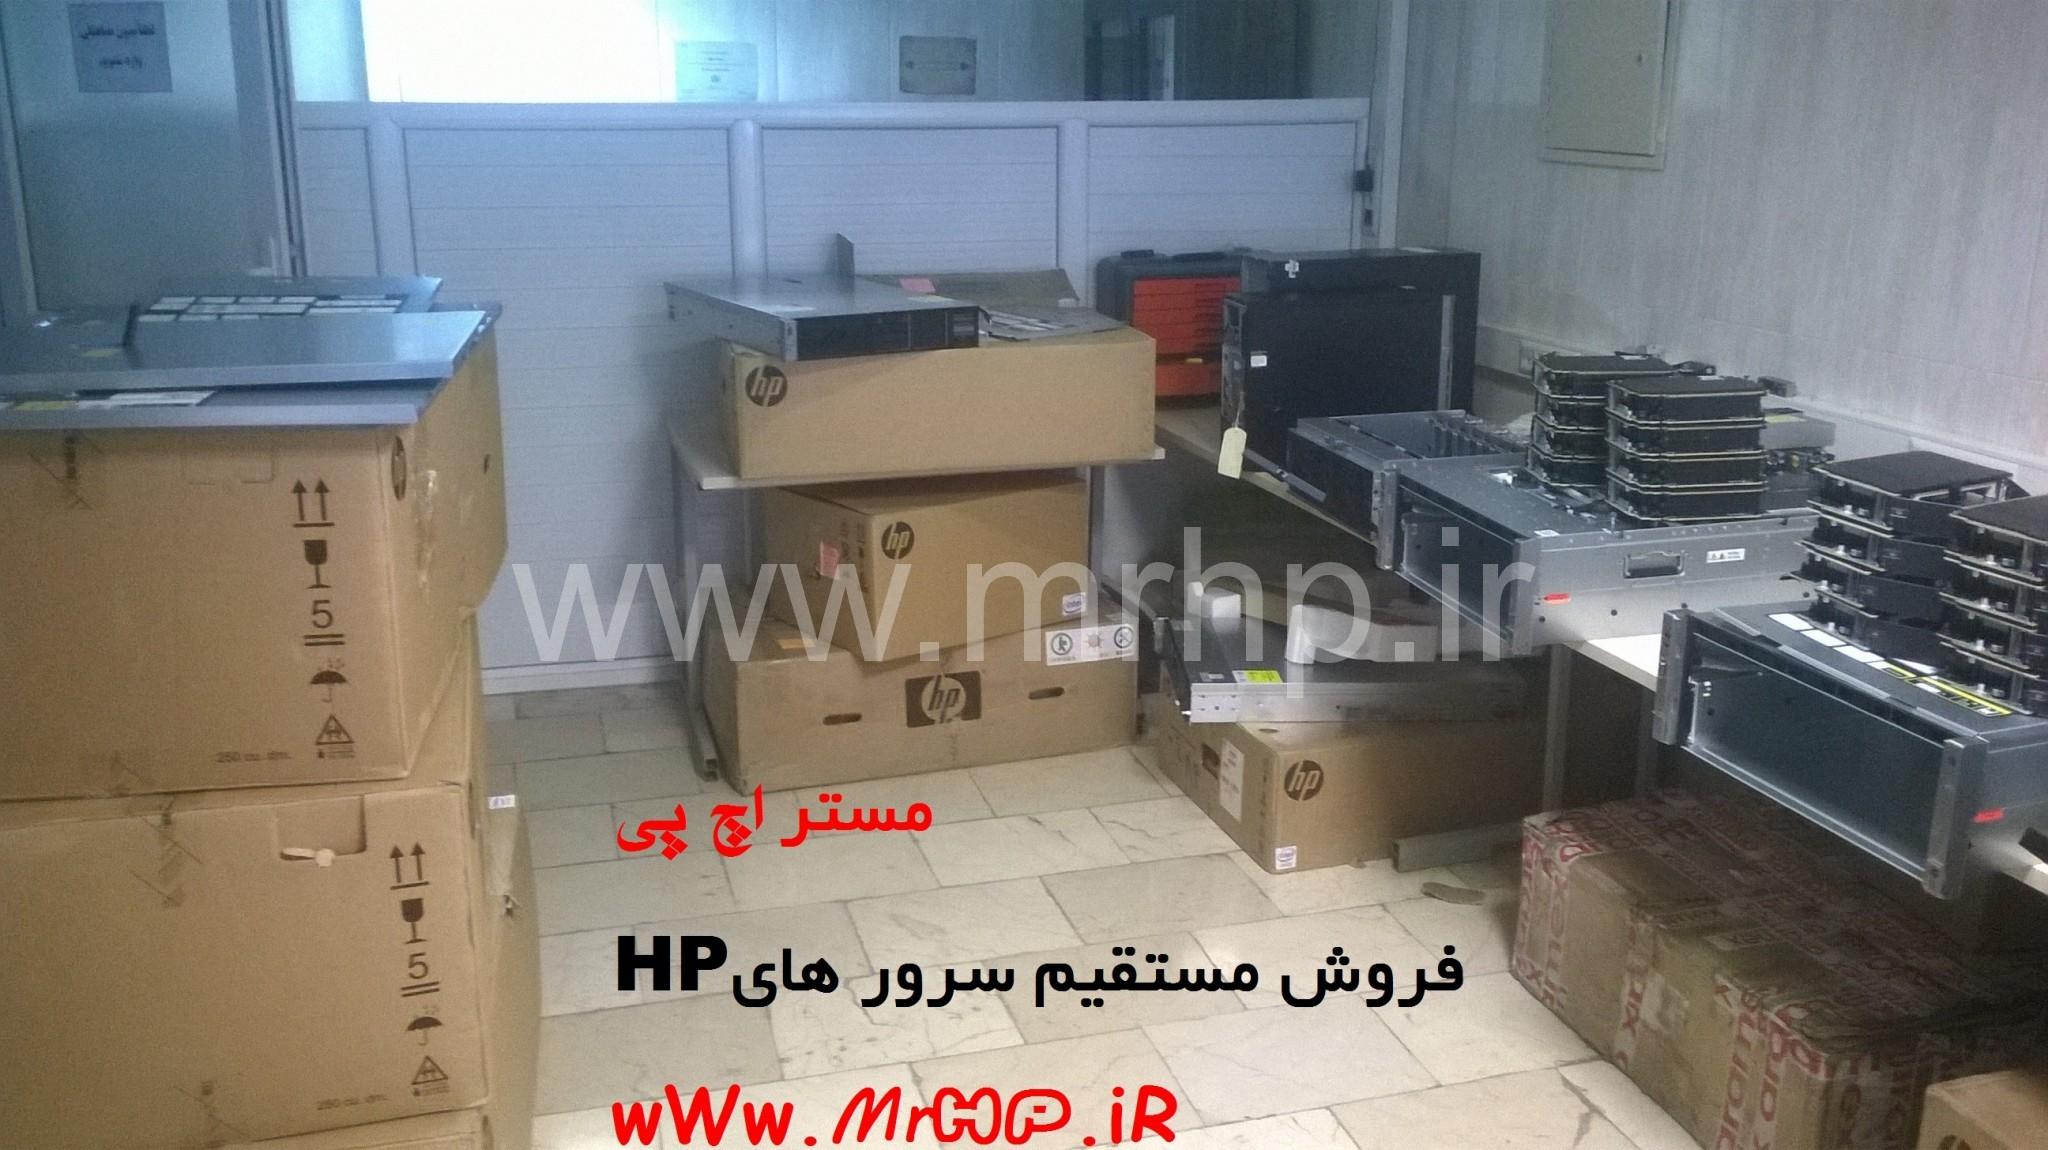 سرور hp proliant dl580 gسرورml310,dl380g9,dl380g8,dl380g7,سرورhp,رمhp,هاردhp,نمایندگیhp,اورجینال,9